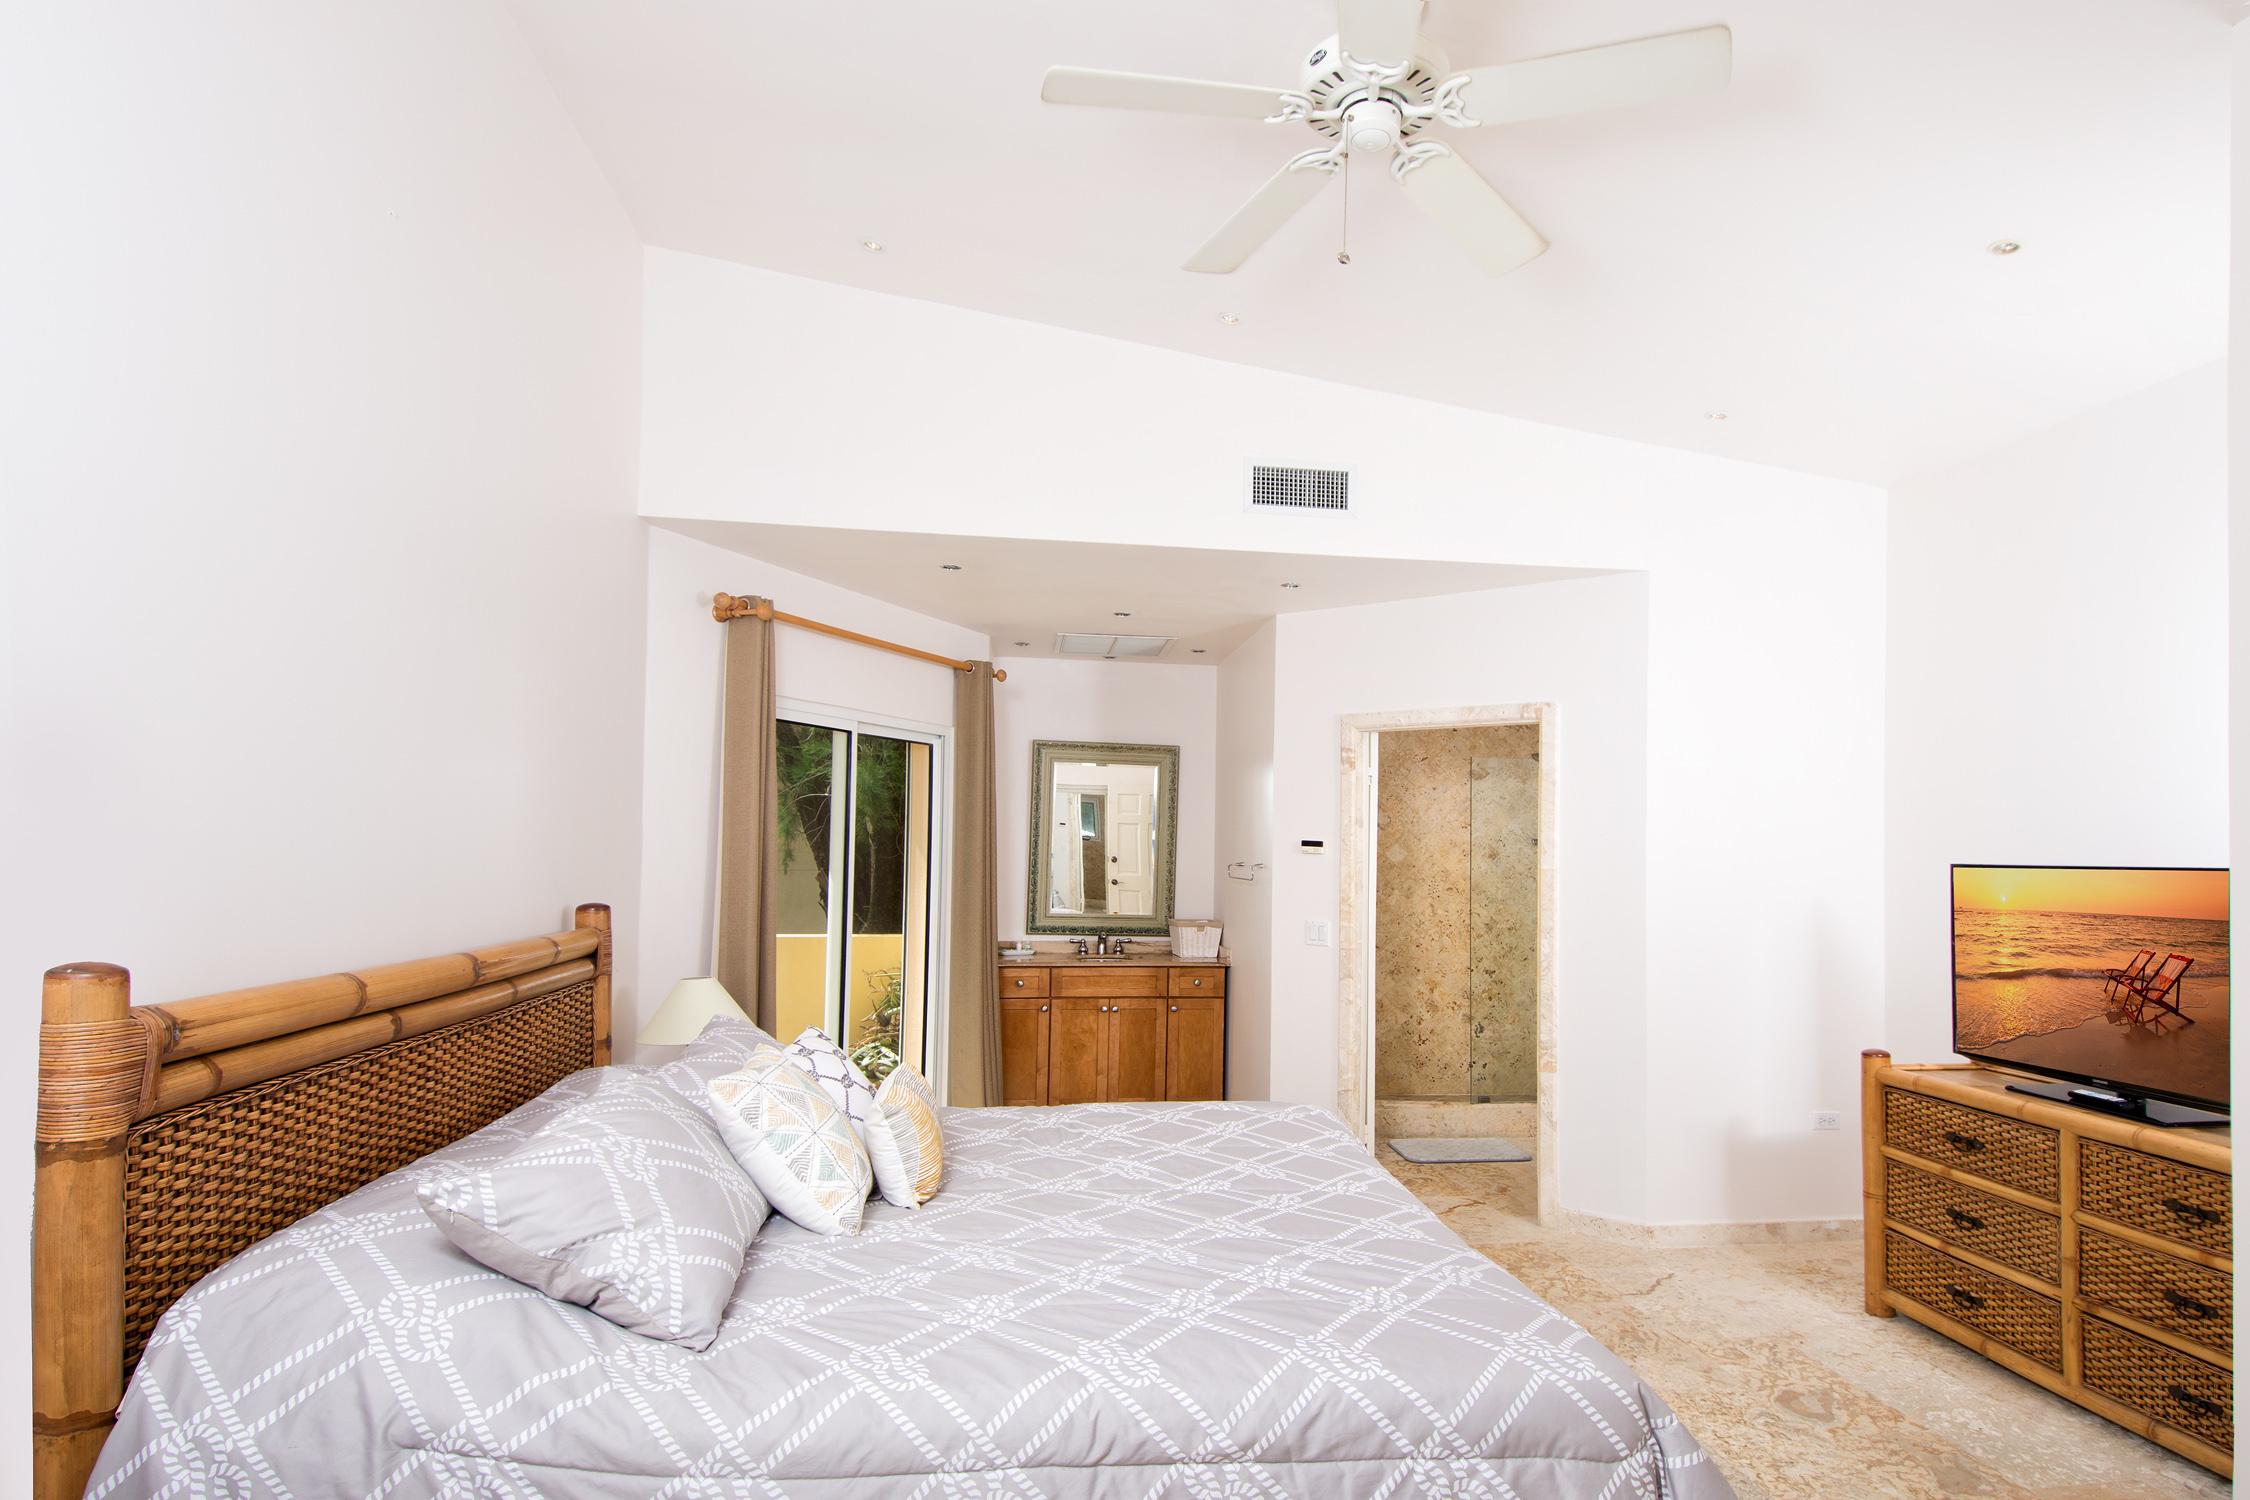 SM404 Bedroom #3